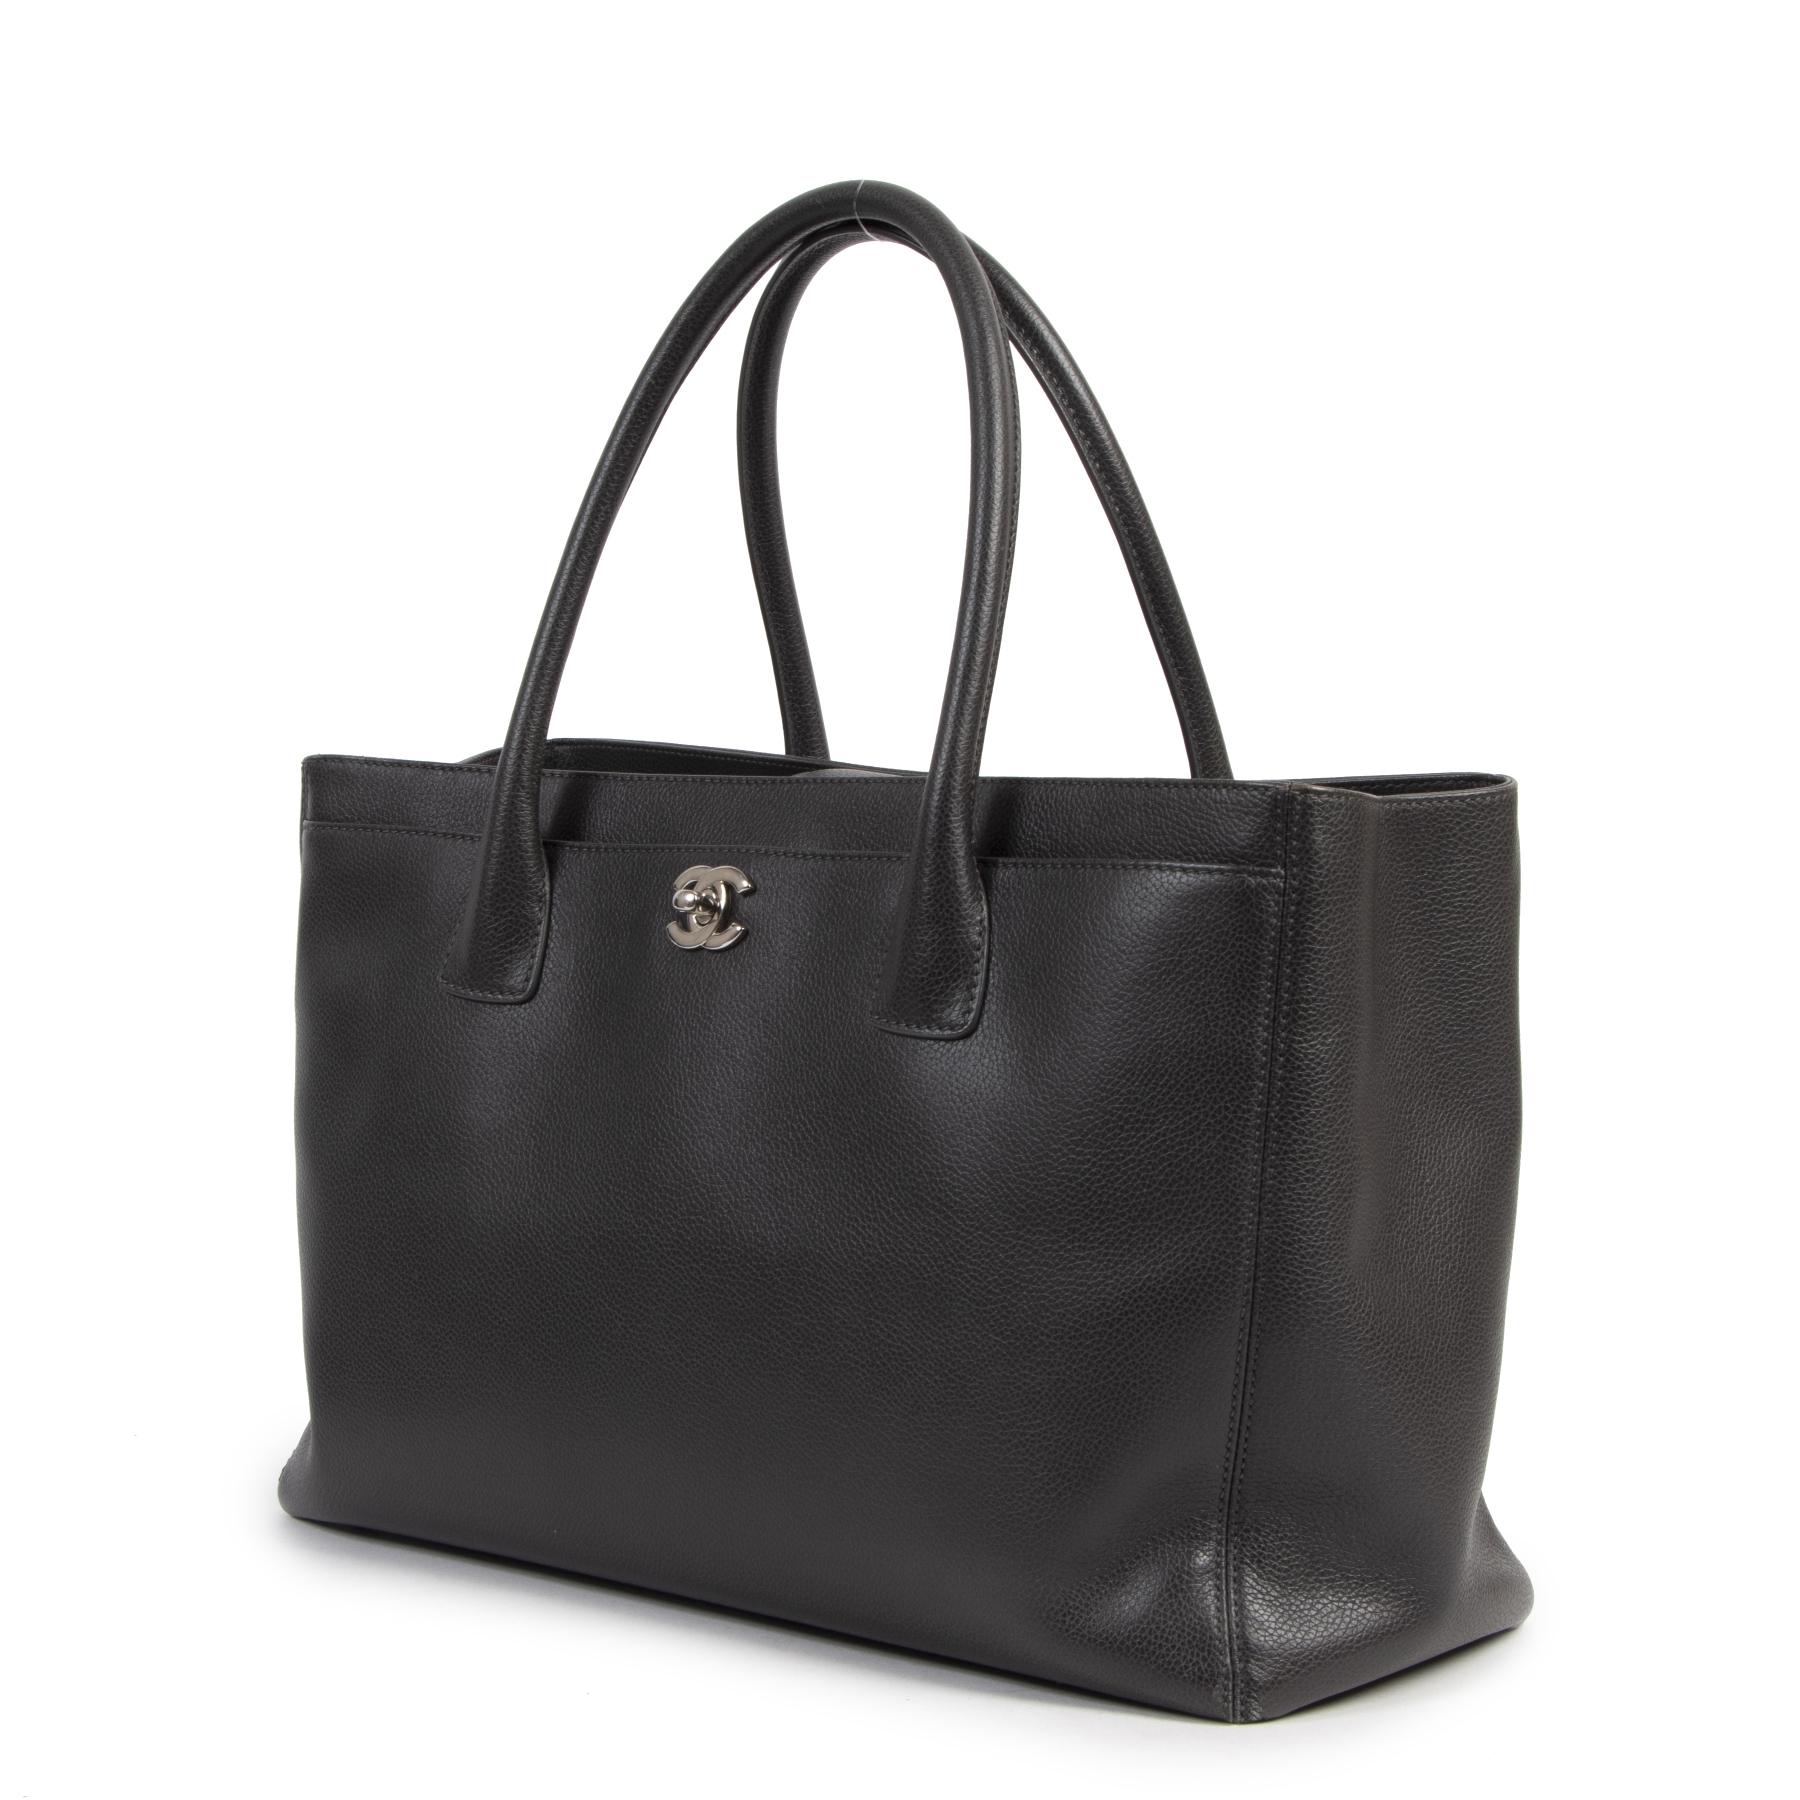 Authentique seconde-main vintage Chanel Dark Grey Executive Cerf Tote Bag achète en ligne webshop LabelLOV